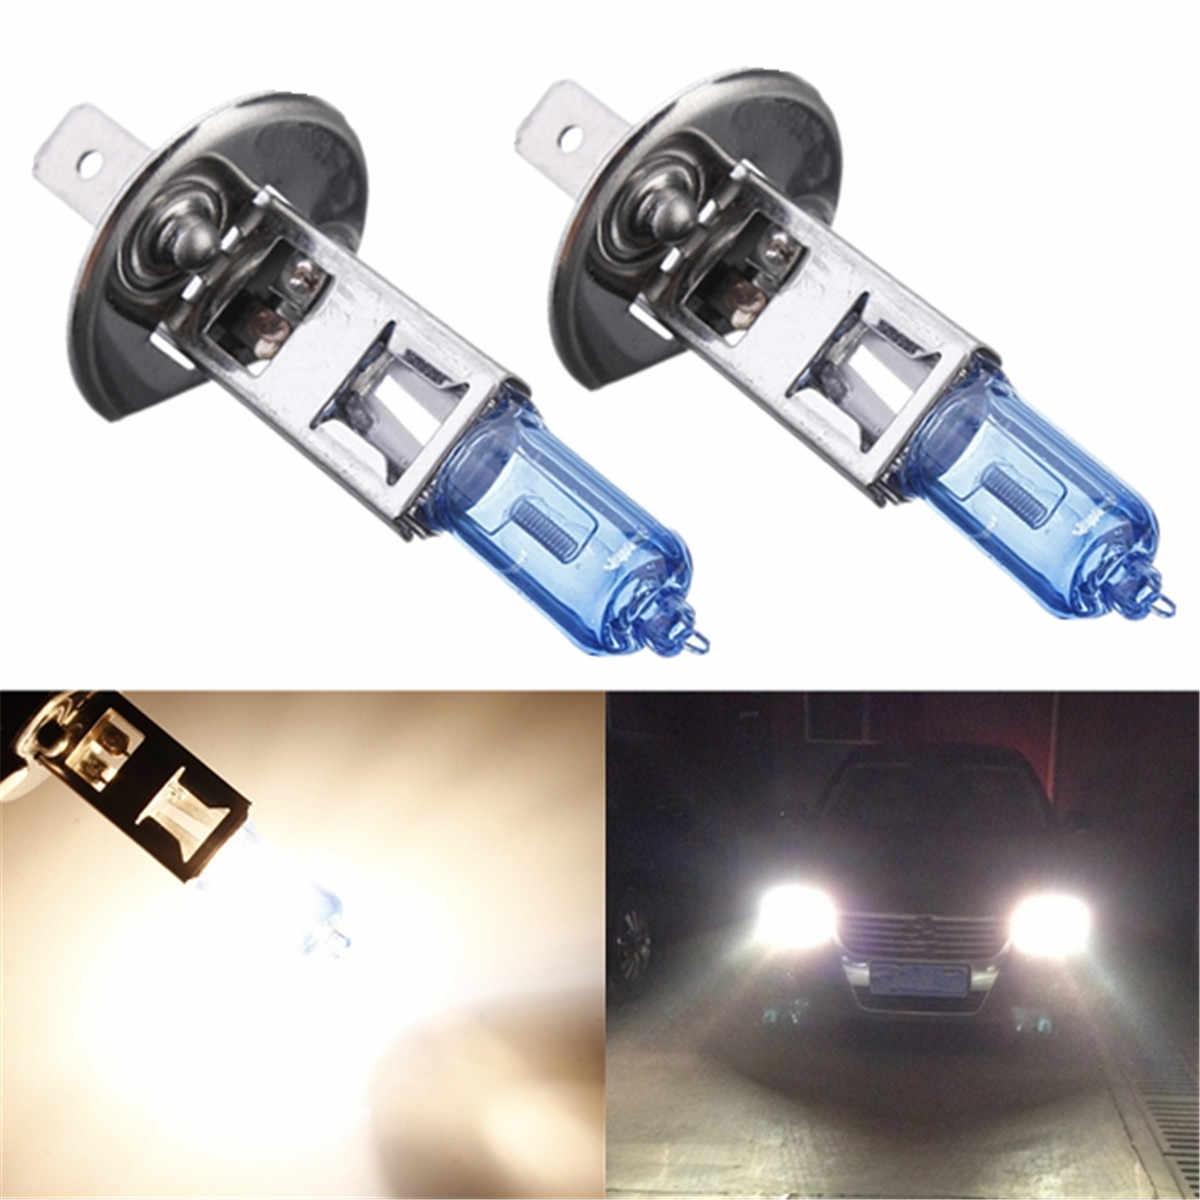 100W 1/2/4/10pcs H1 Super Bright White Fog Halogen Bulbs Car Headlight Lamp Lights 12V car styling car light source parking auto